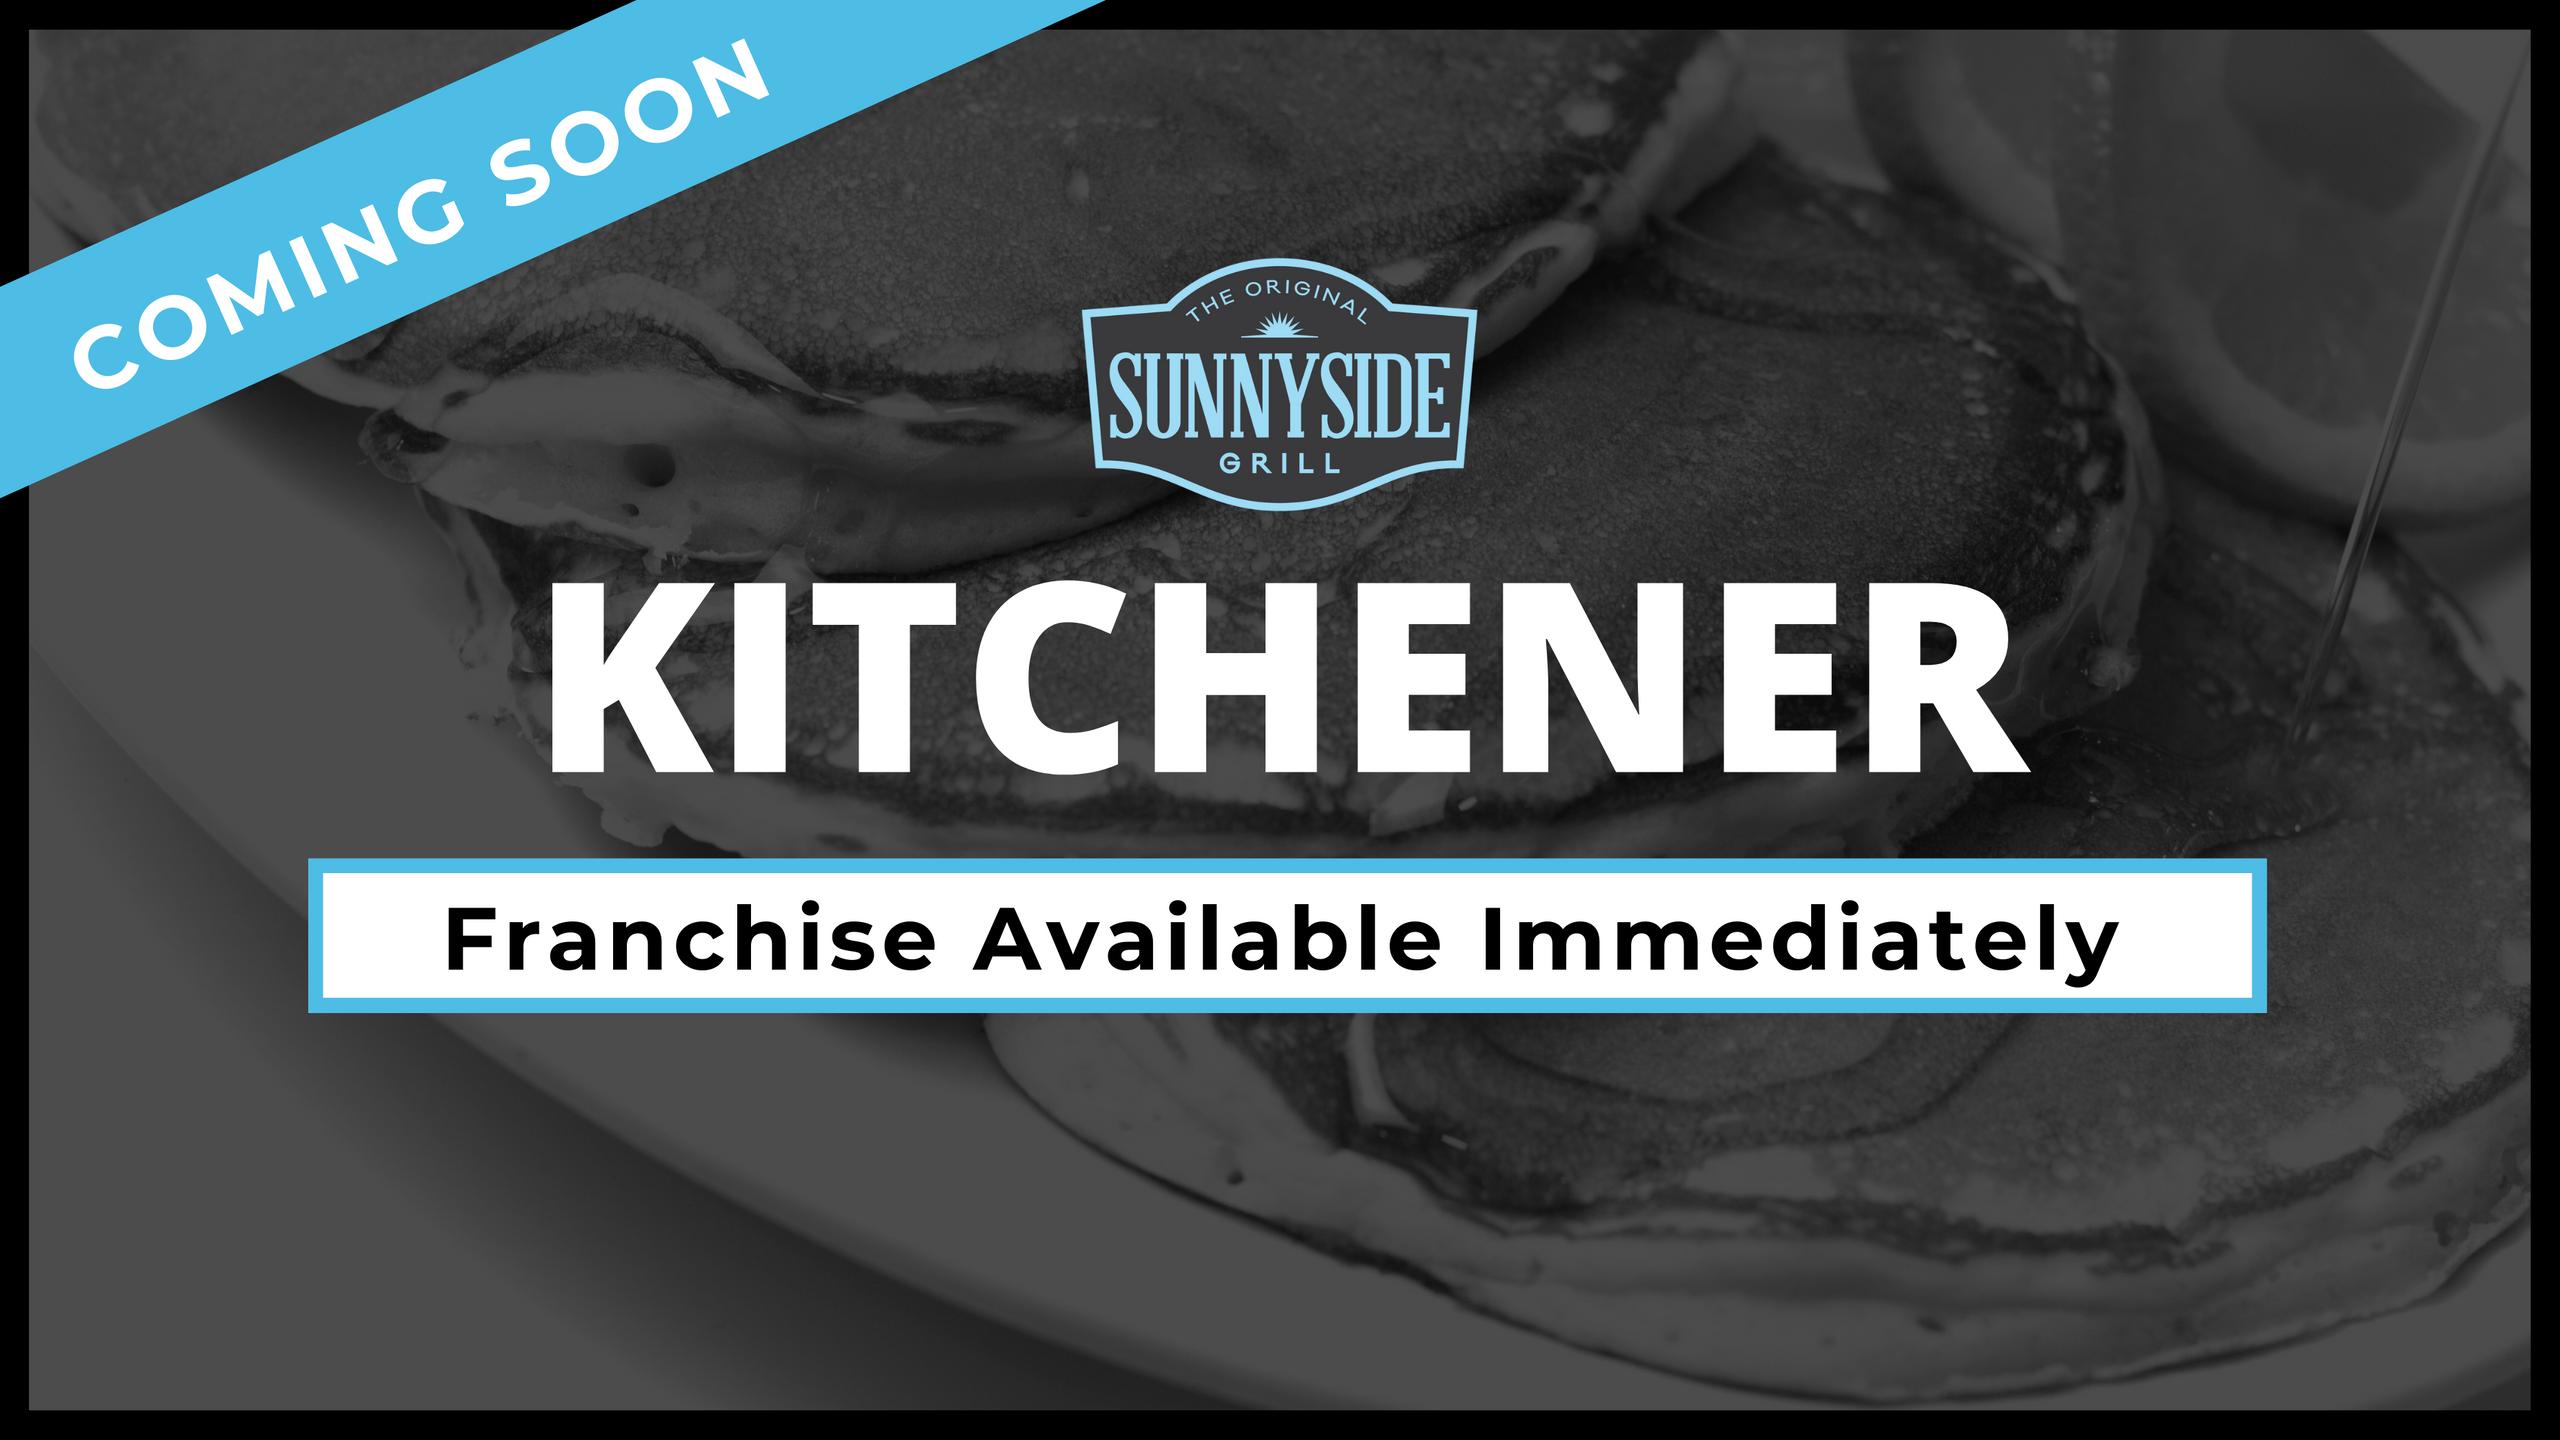 Kitchener Franchise Available